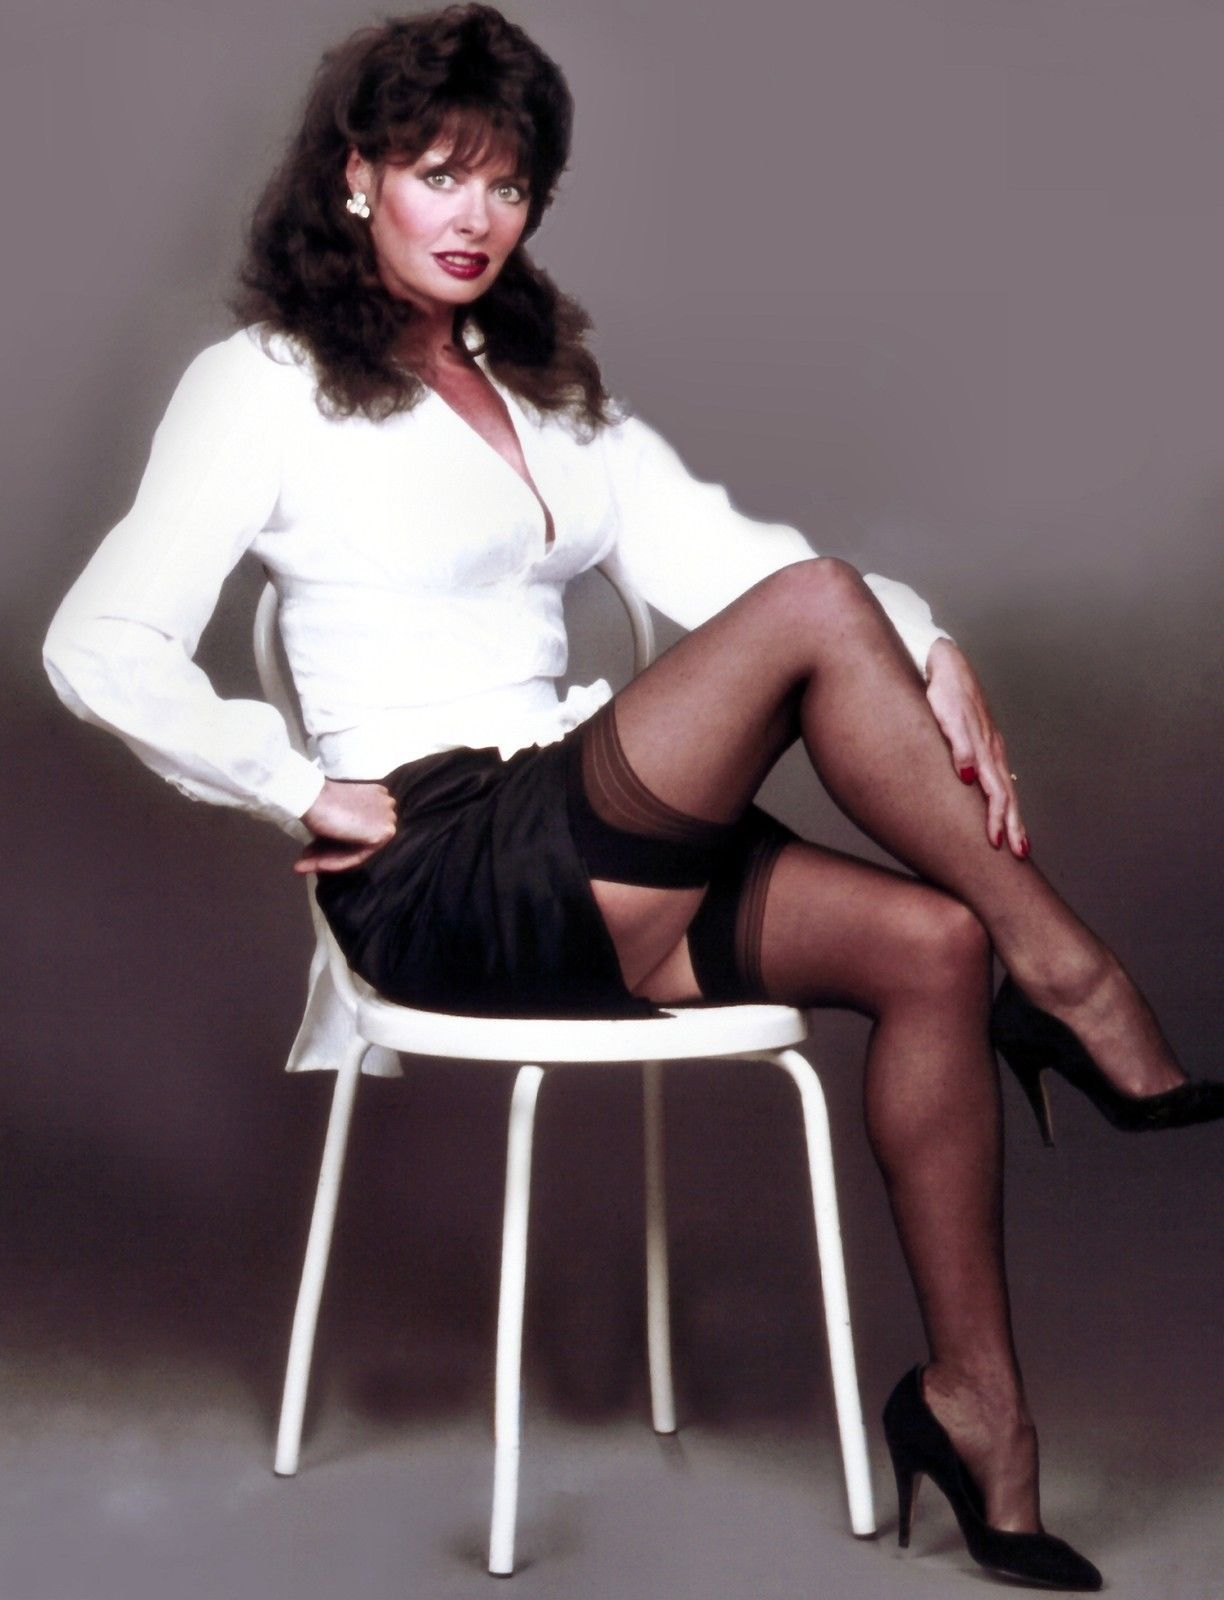 Vicki vicky stockings valuable